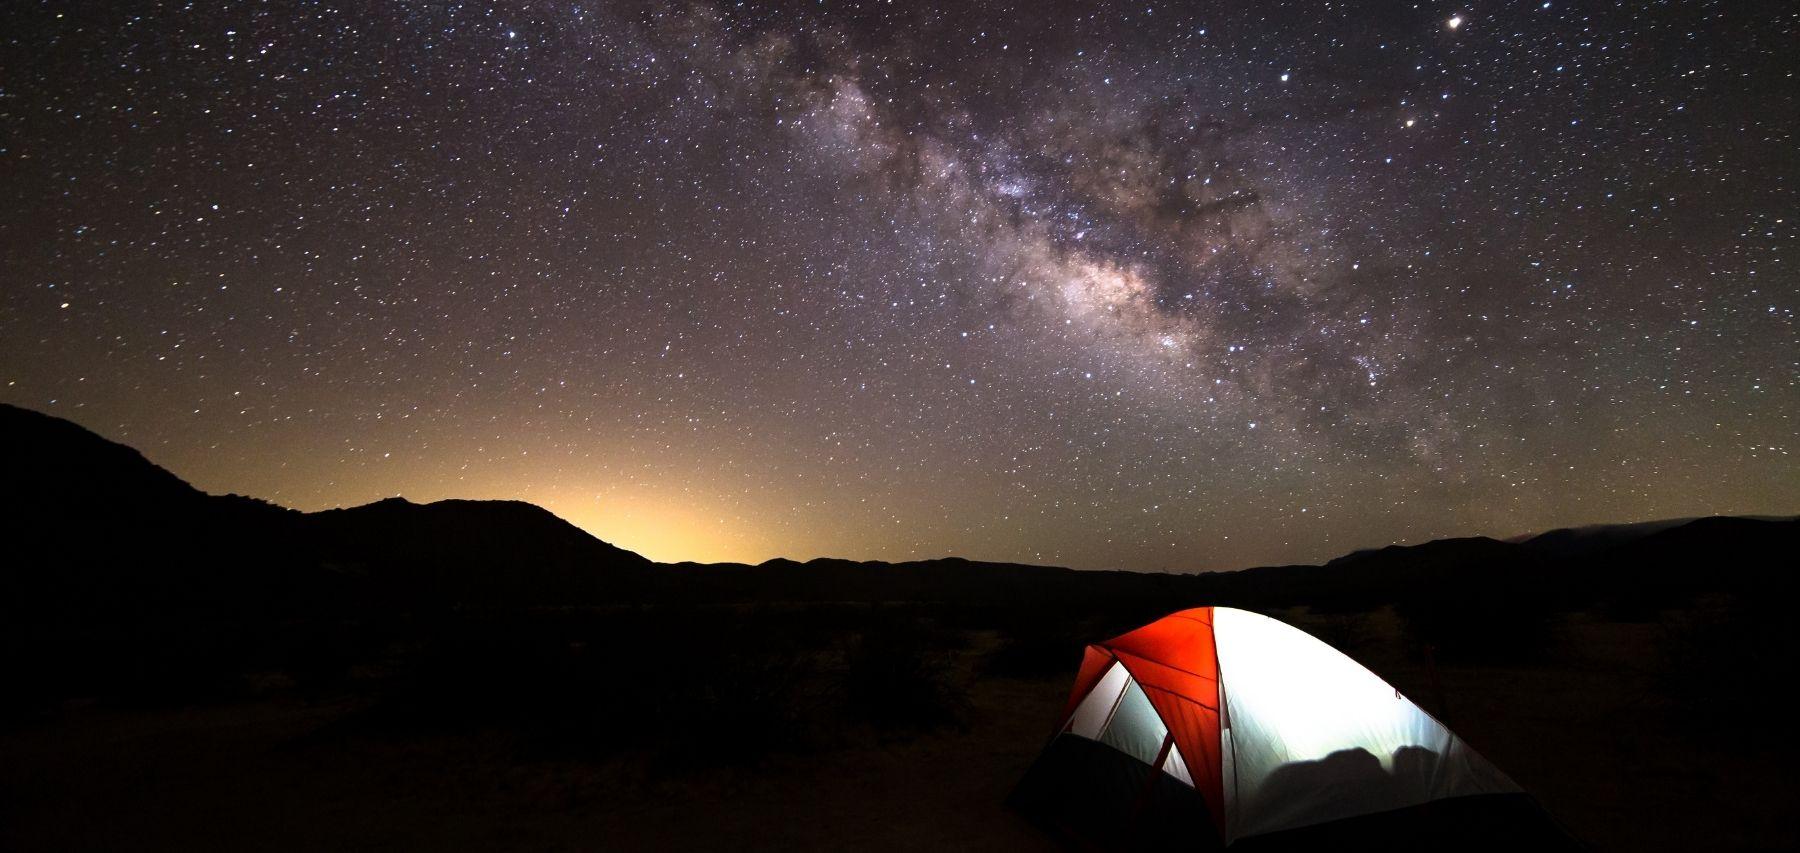 Camping-under-moonlight-Anza-Borrego